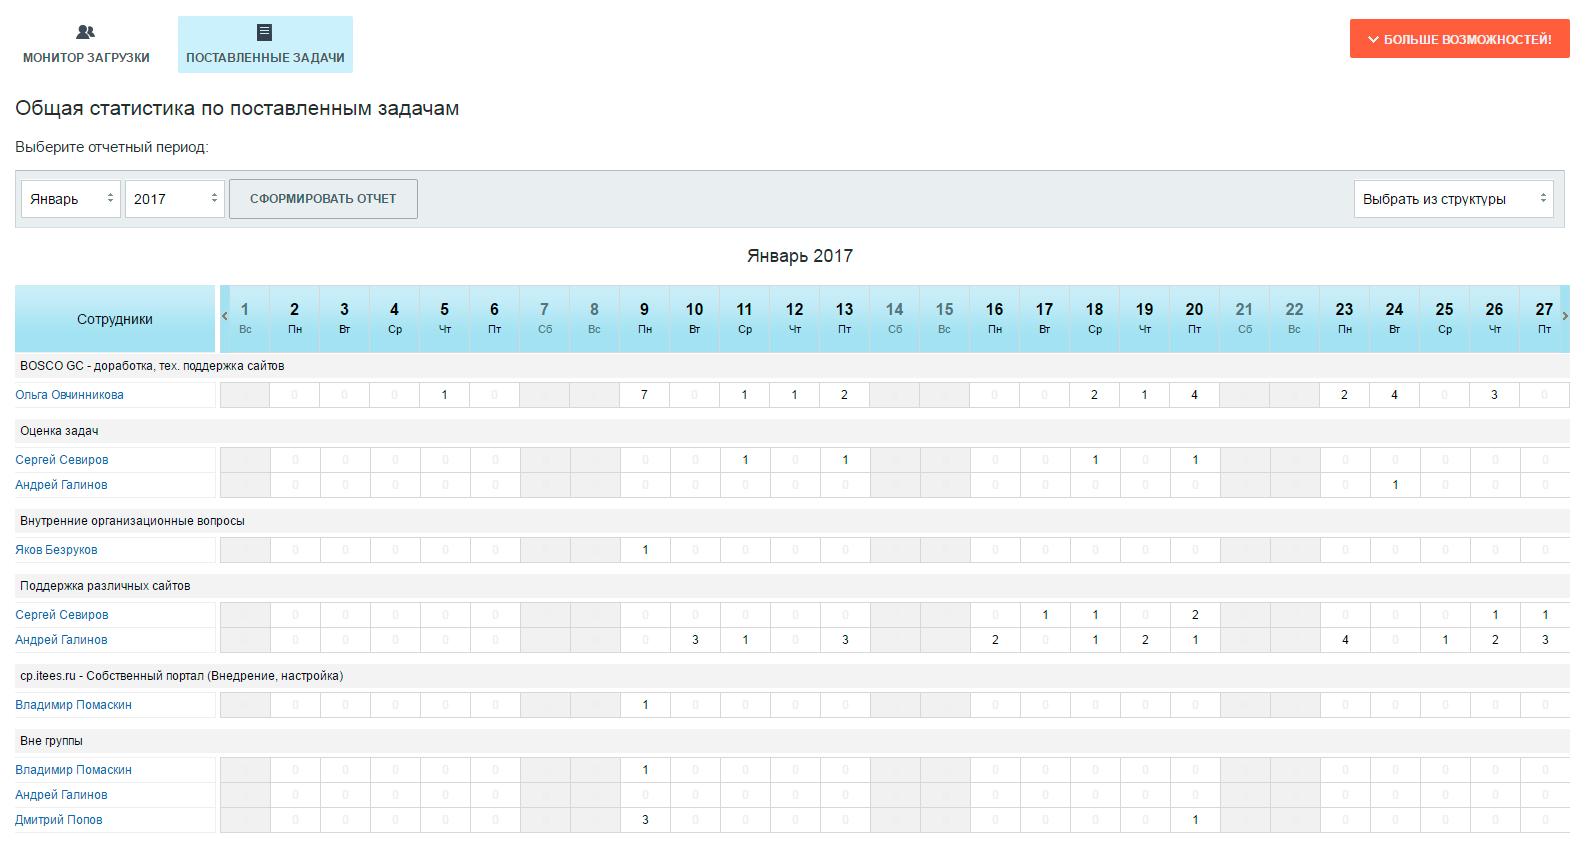 Битрикс загрузка сотрудников битрикс параметры каталога